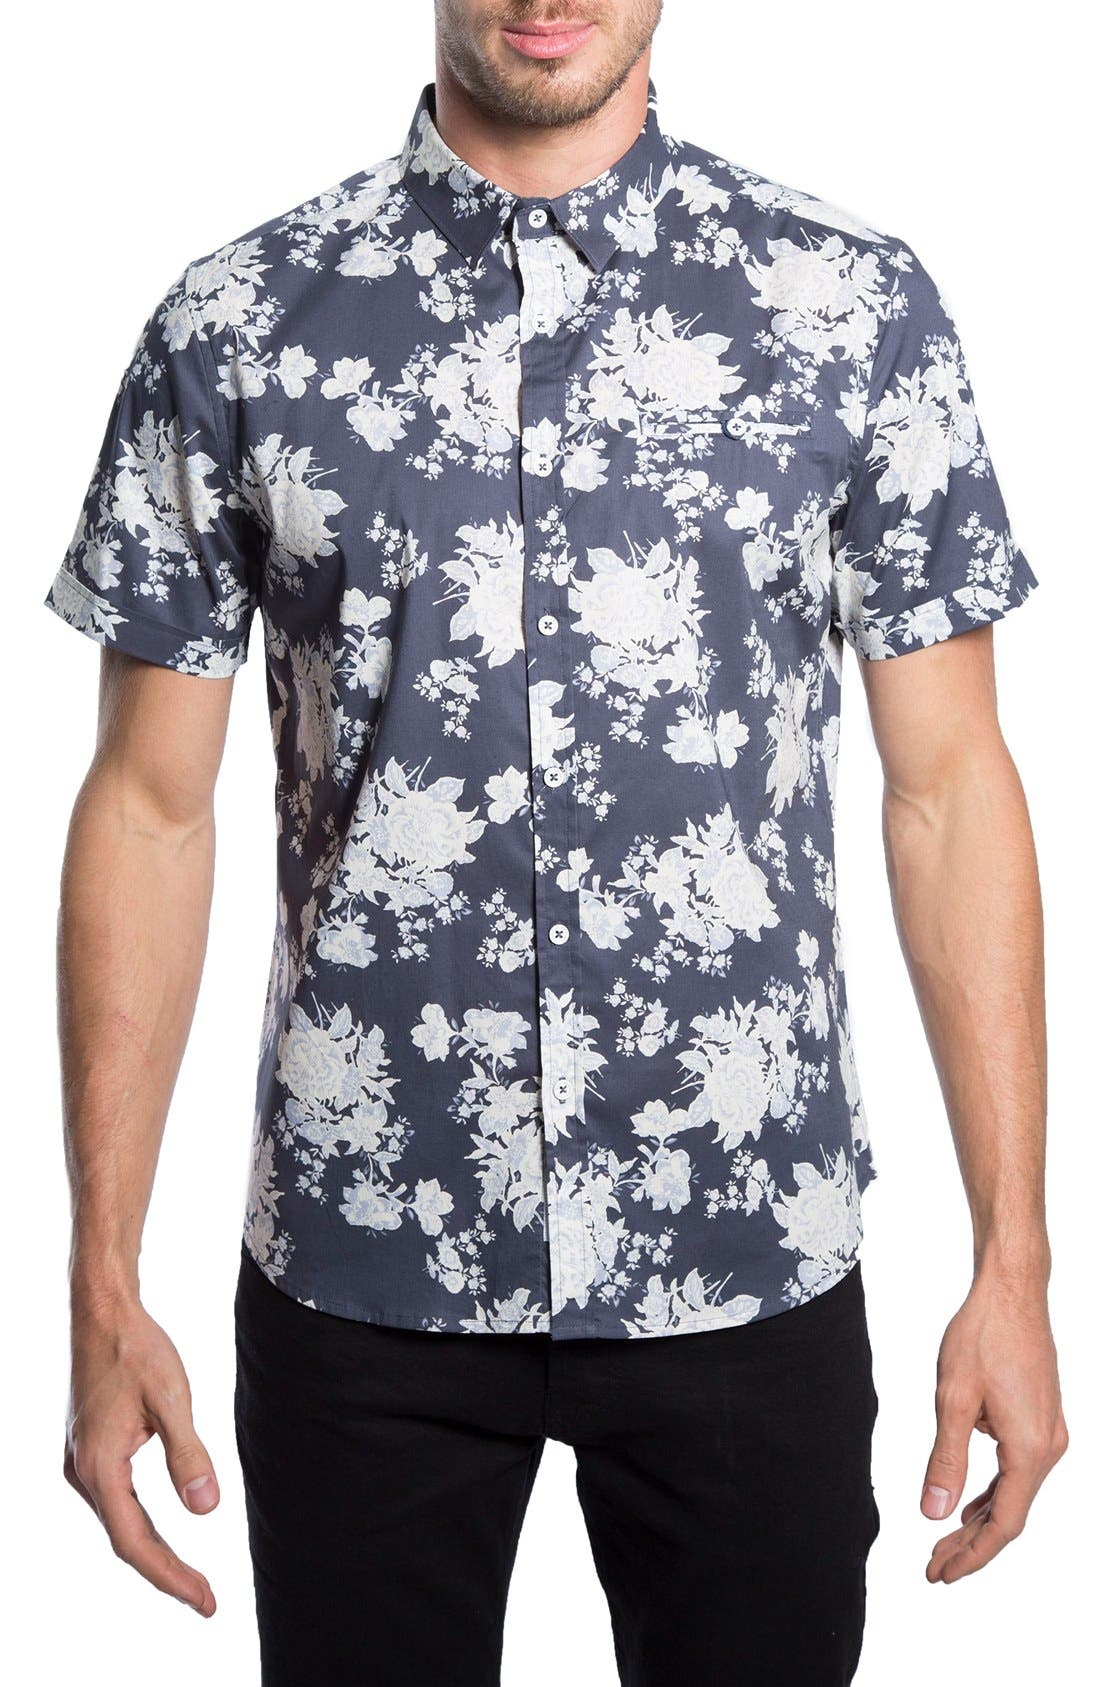 'Better Place' Trim Fit Floral Short Sleeve Woven Shirt,                         Main,                         color, 410